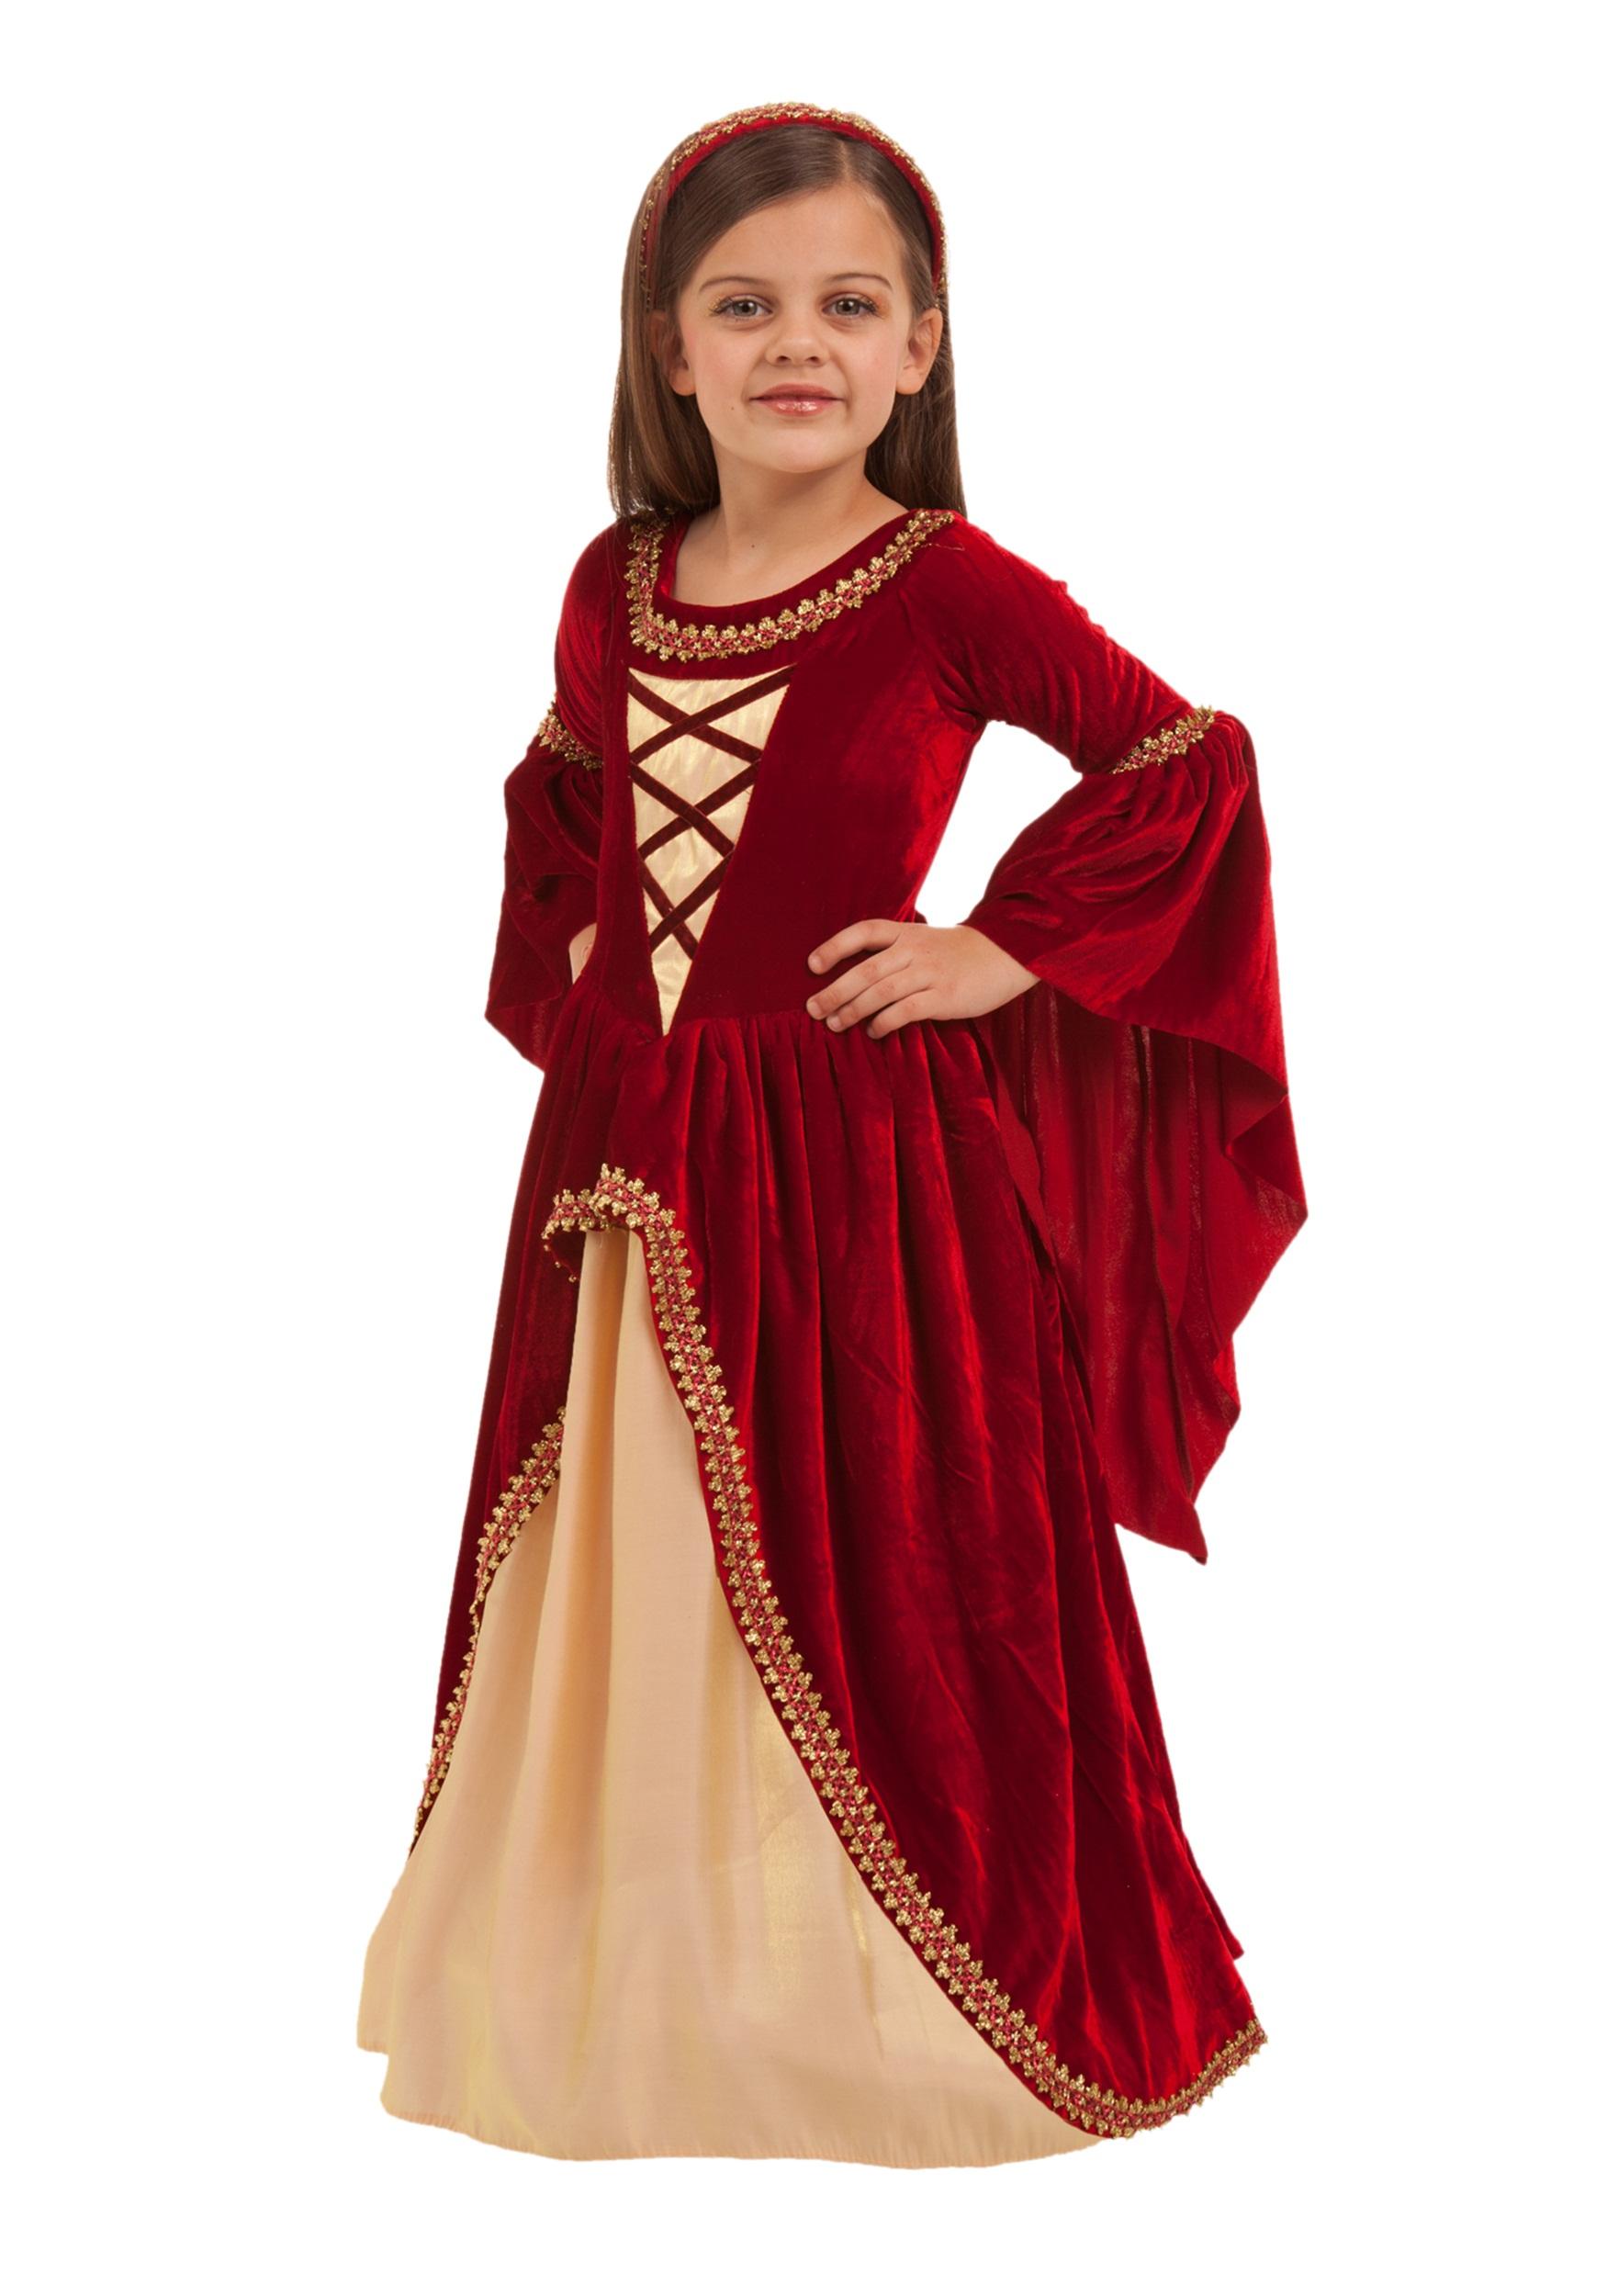 Alessandra the Crimson Princess Girls Costume